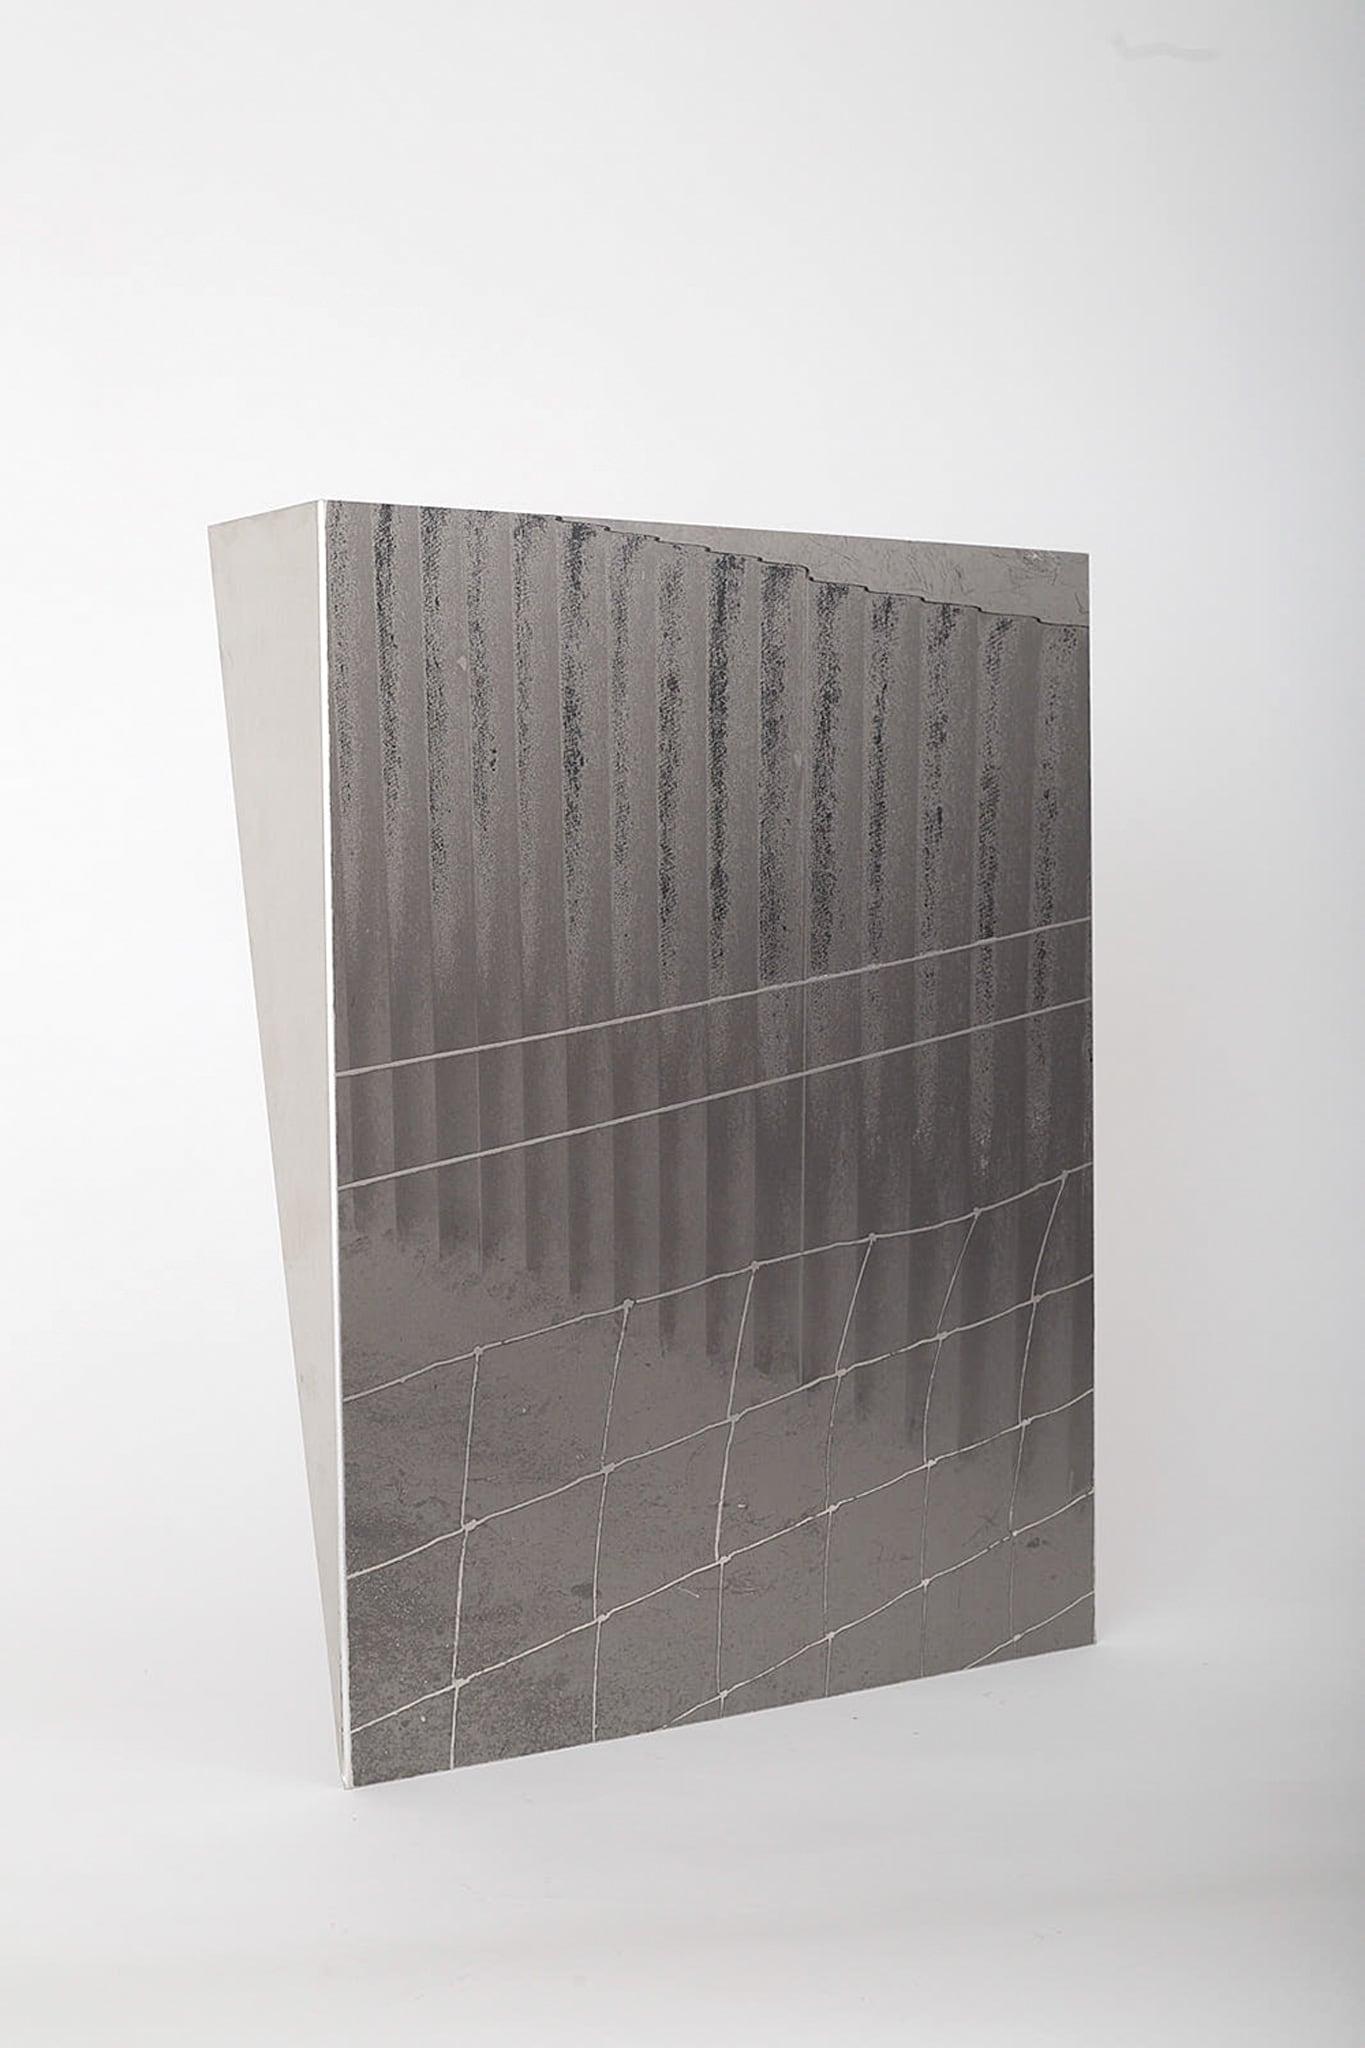 <p><i>FOLD</i> - Extrusion, 2020. UV Pigment Print on Mechanically Folded Aluminum Plate, 600mm x 400mm</p>